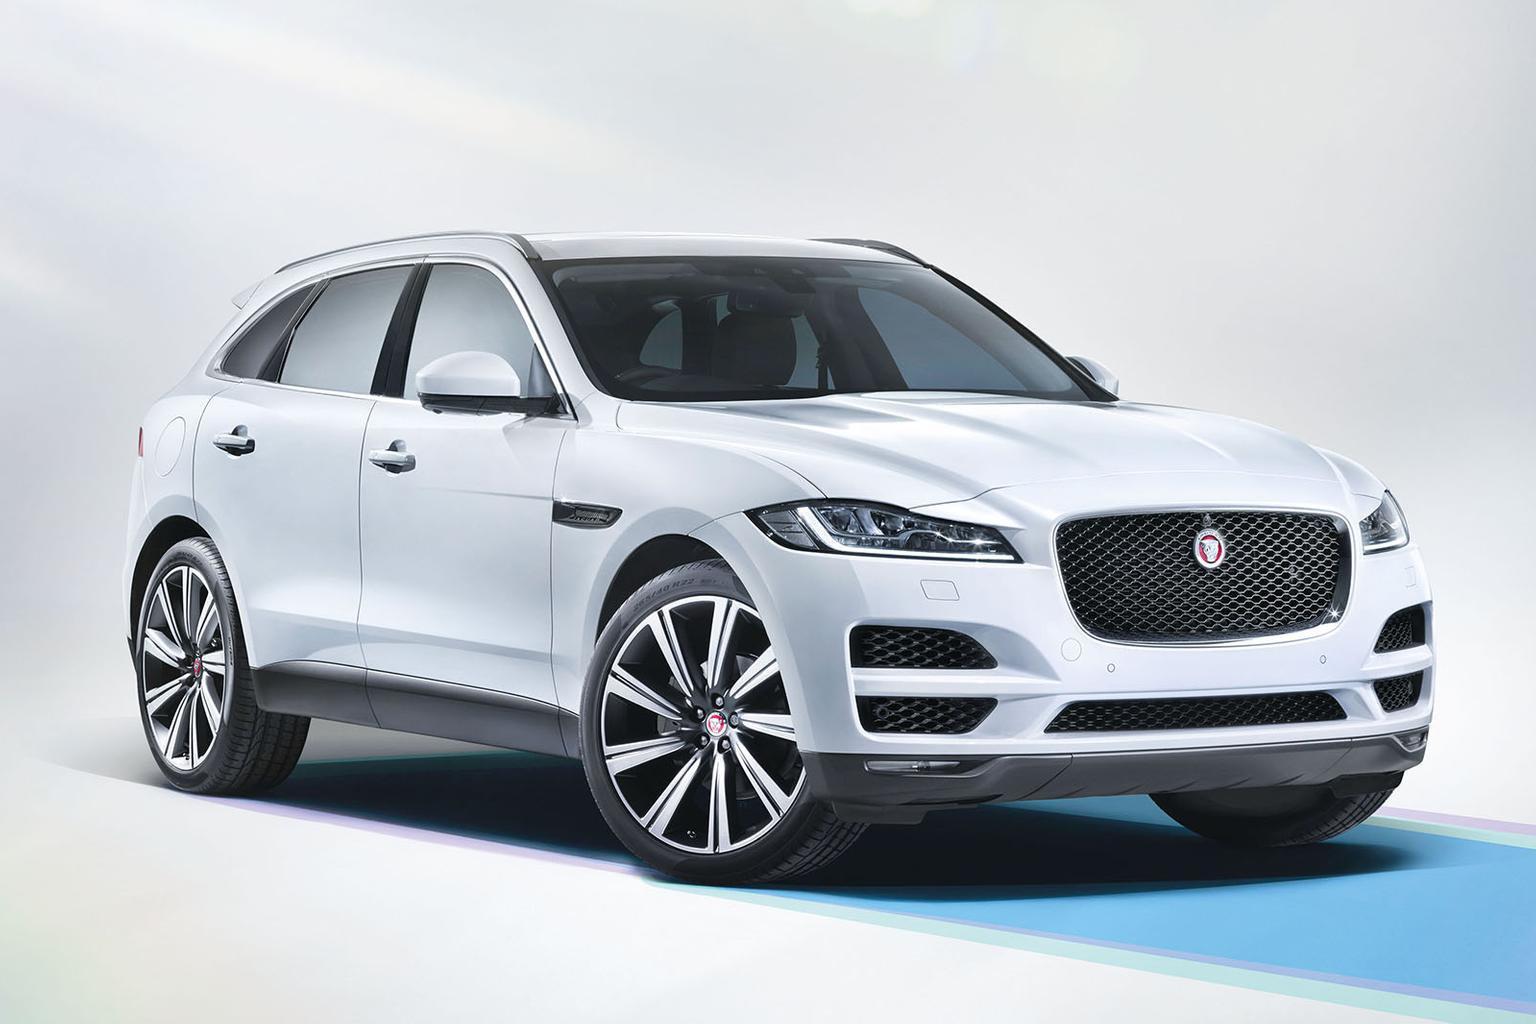 Jaguar F-Pace - What Car? Readers give their verdict